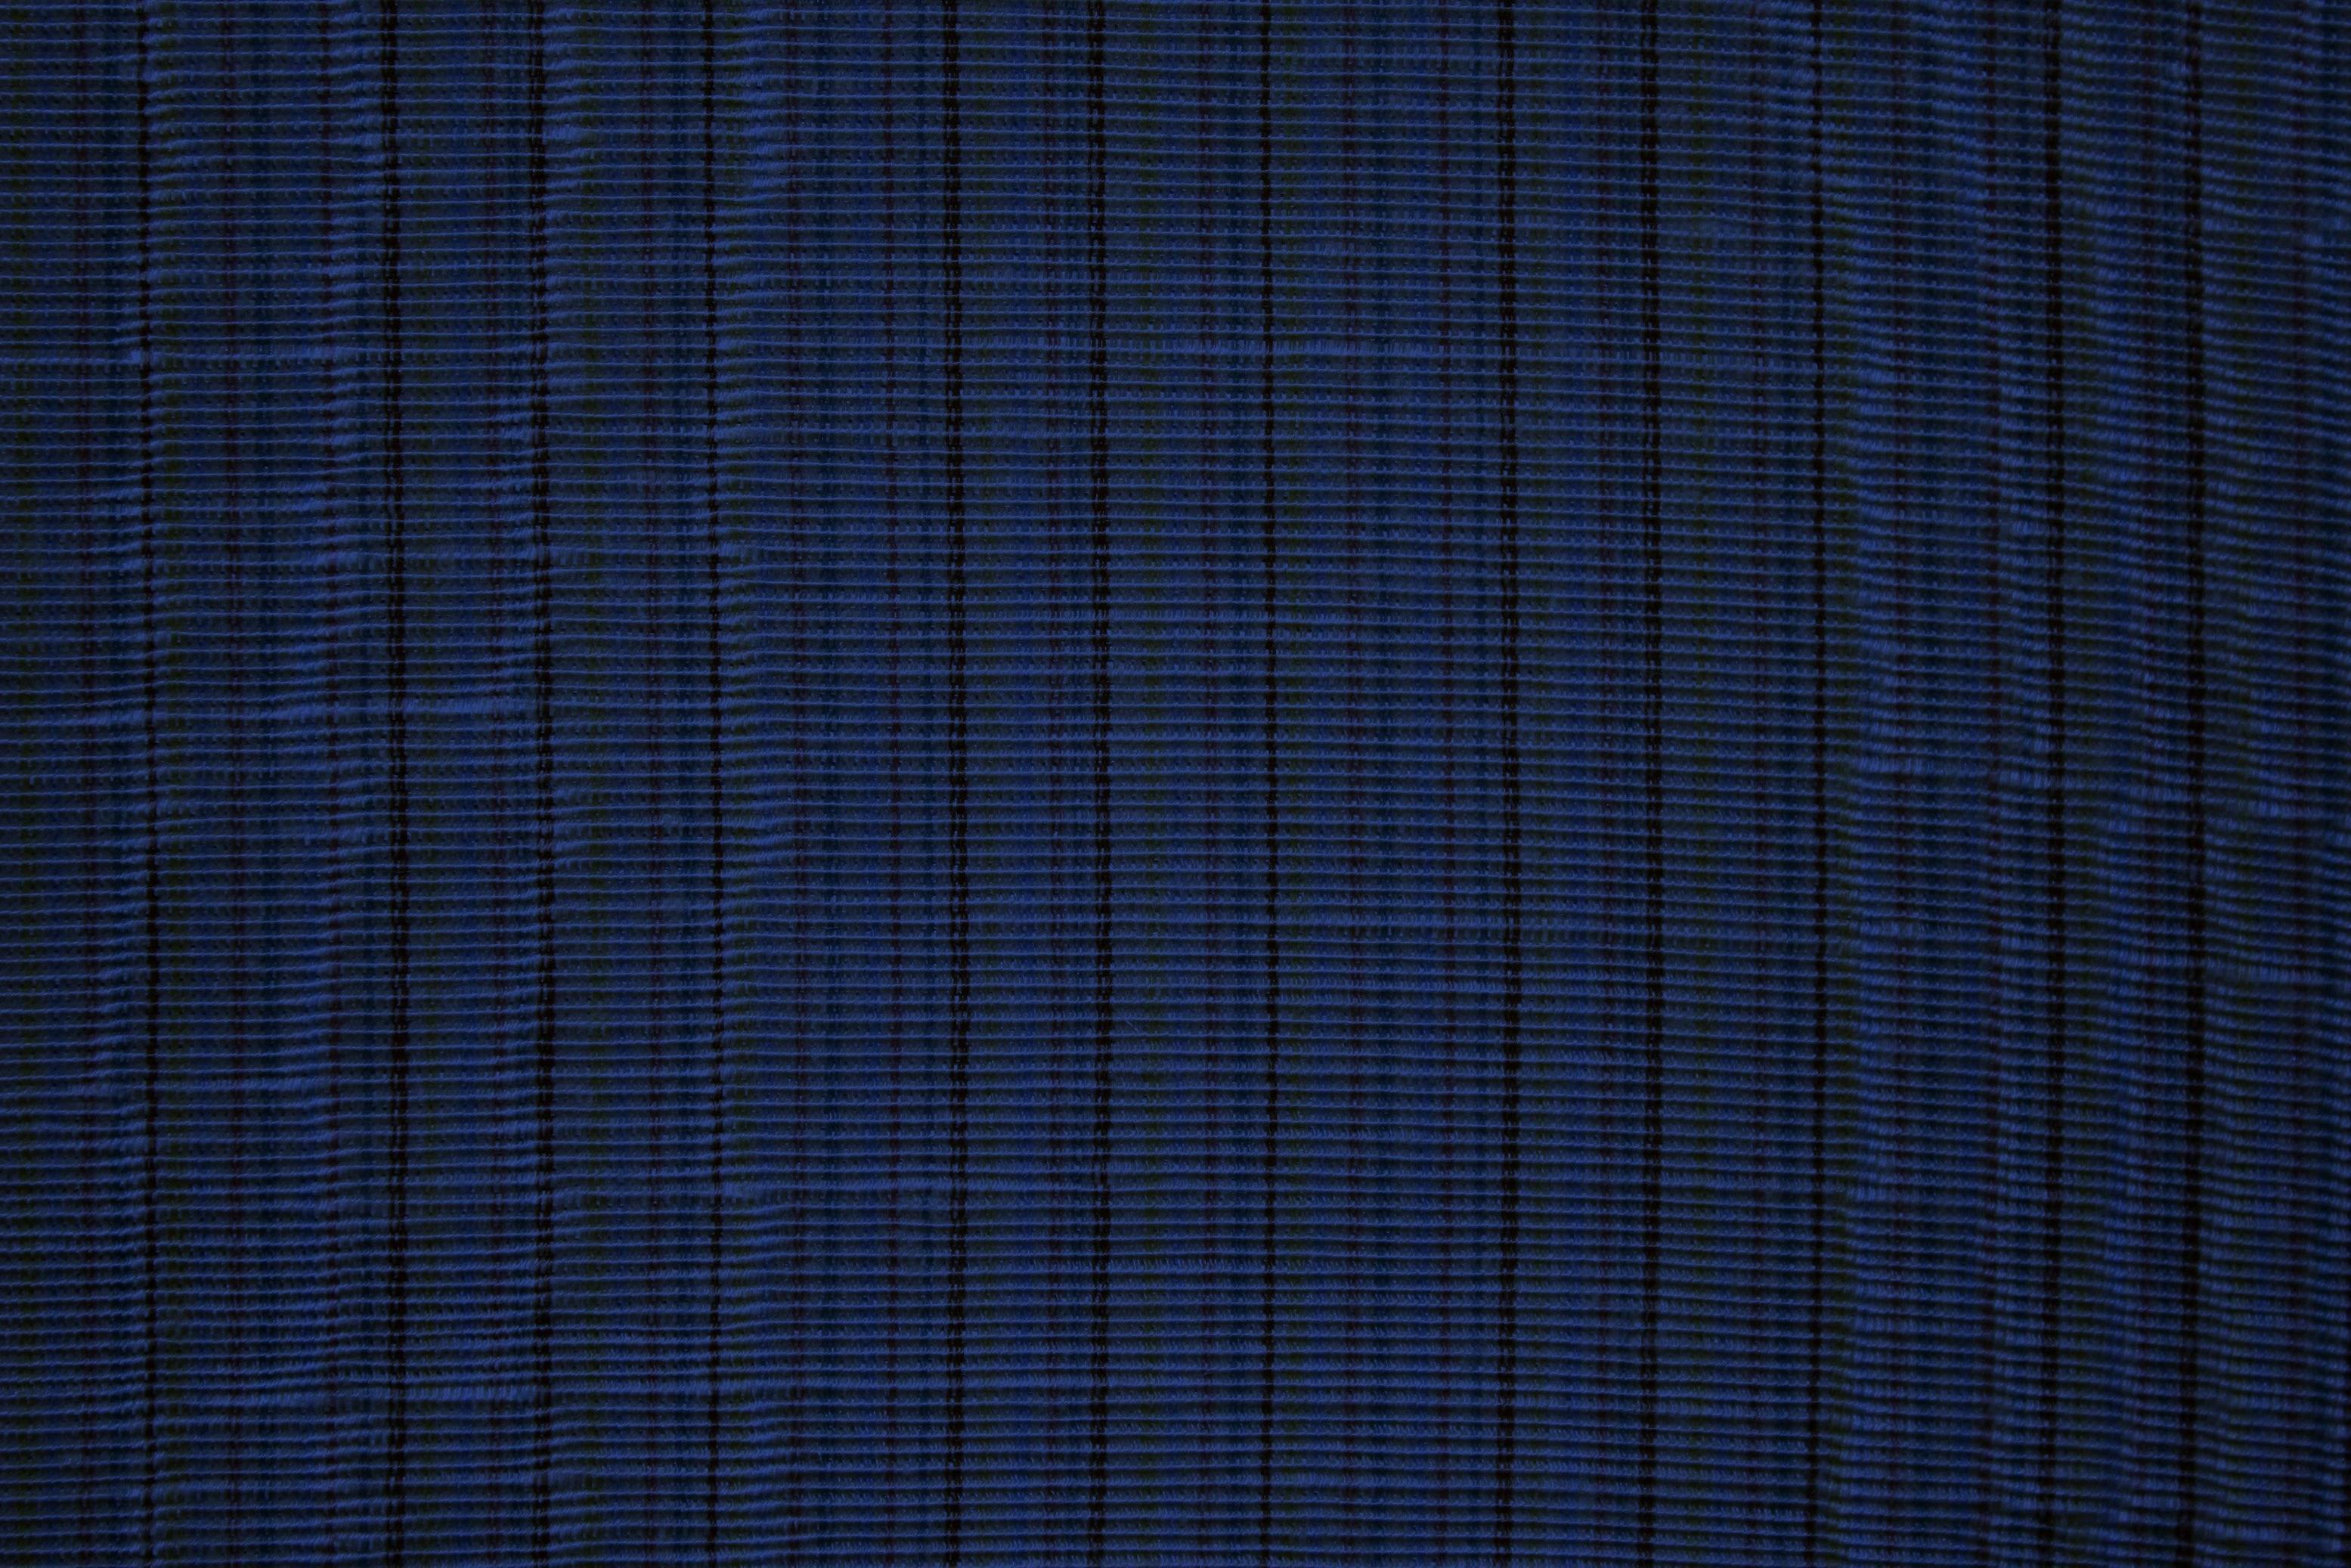 Navy grasscloth wallpaper wallpapersafari for Navy blue wallpaper for walls